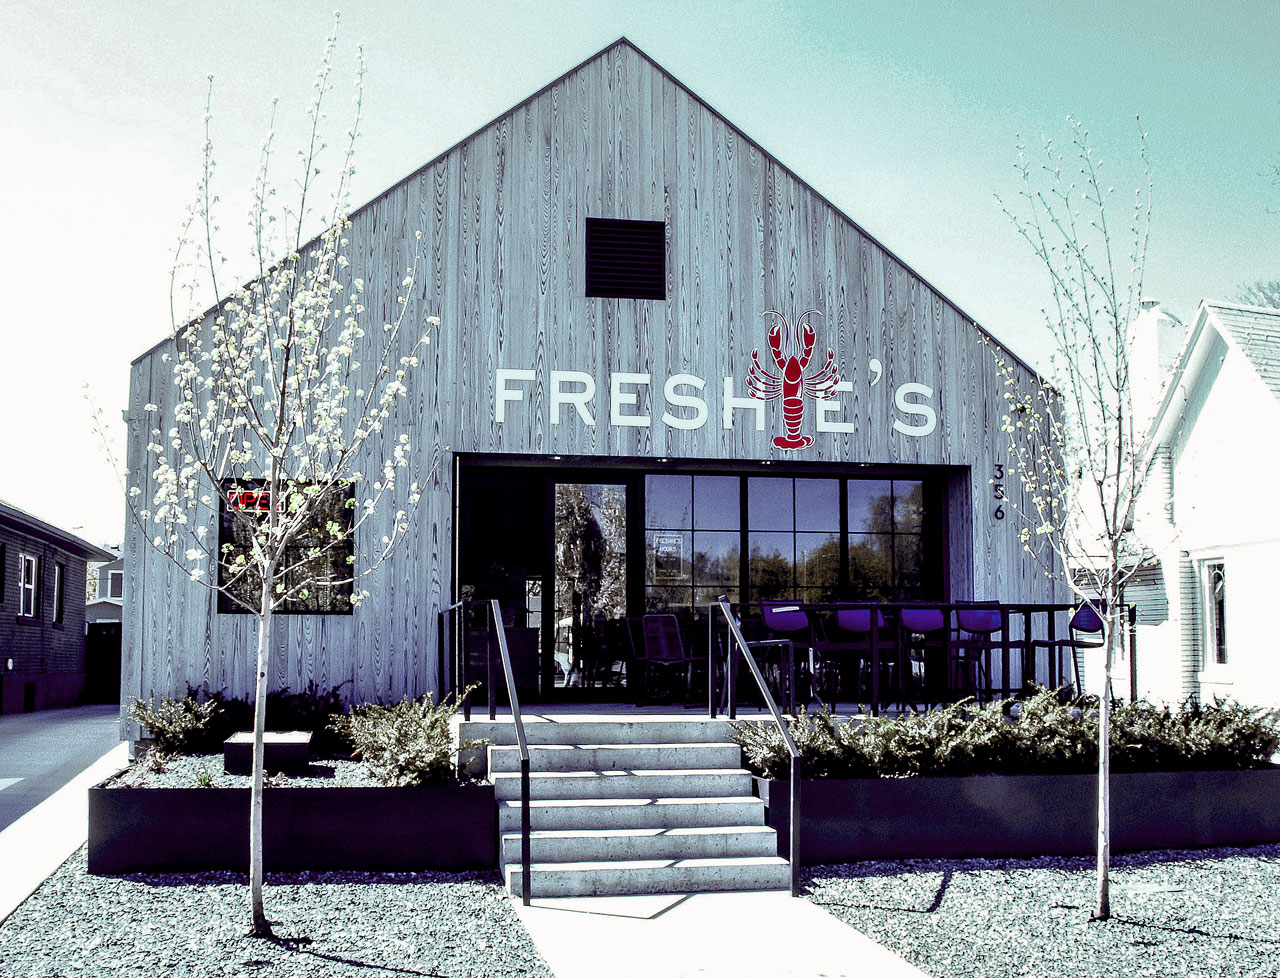 Salt Lake City Freshies storefront